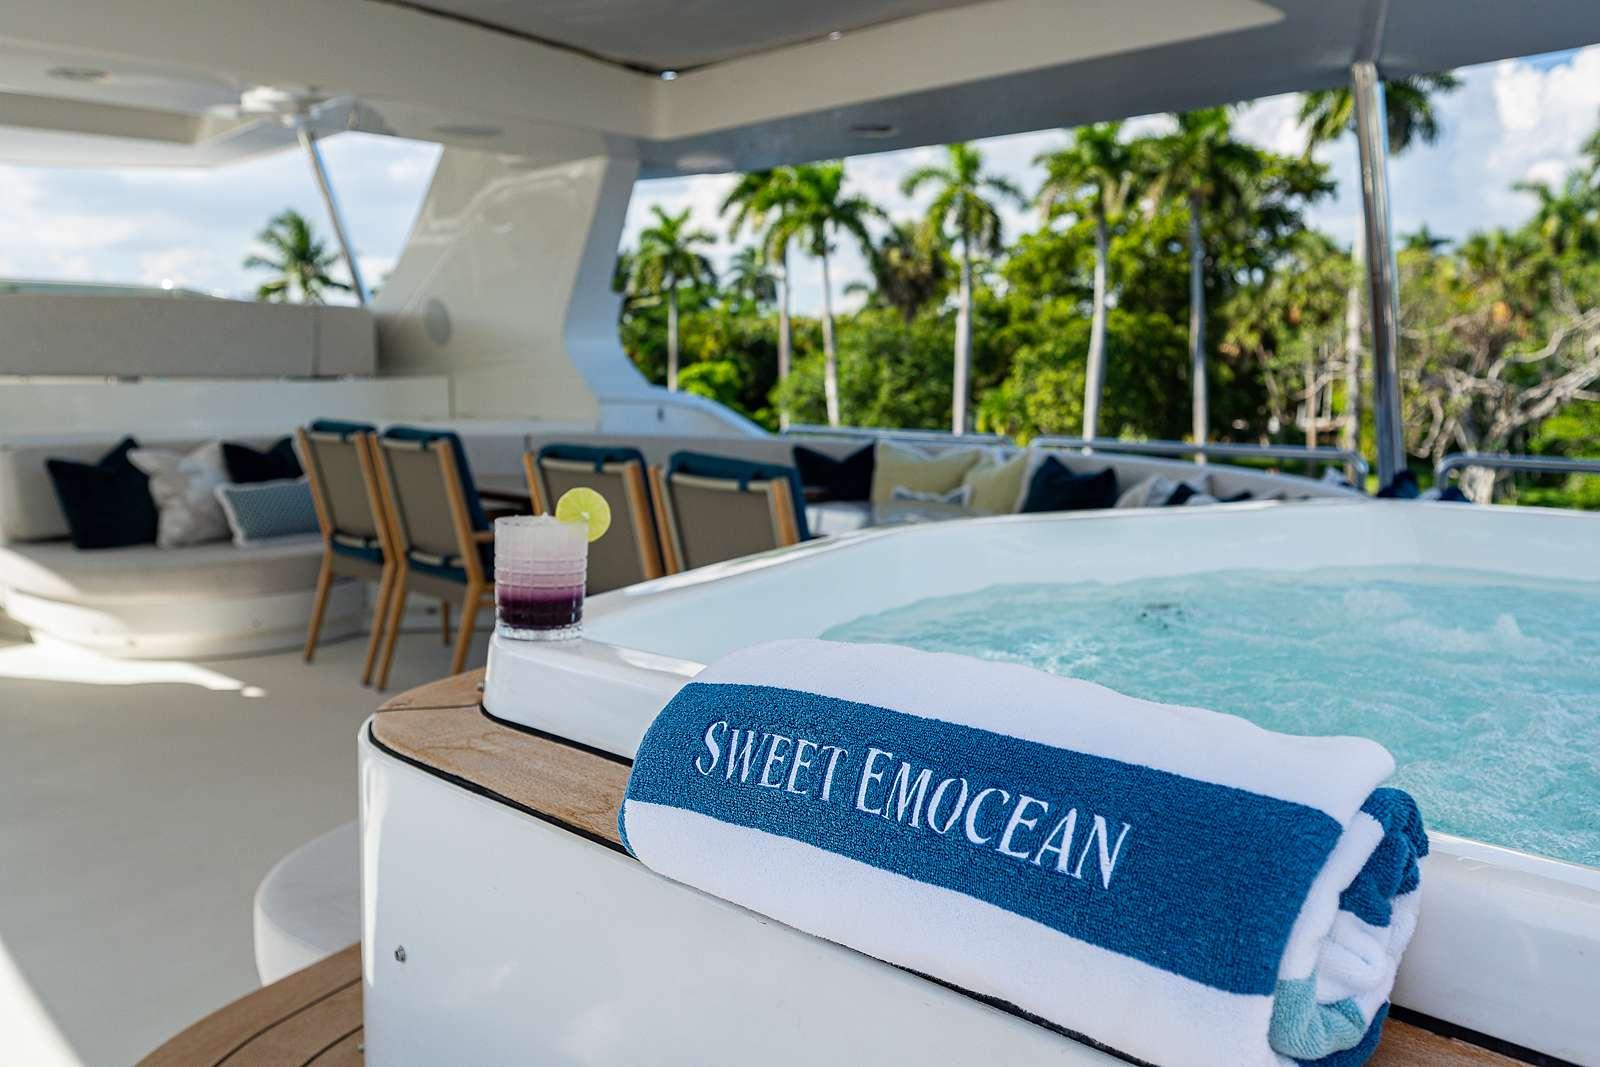 Image of Sweet Emocean yacht #5